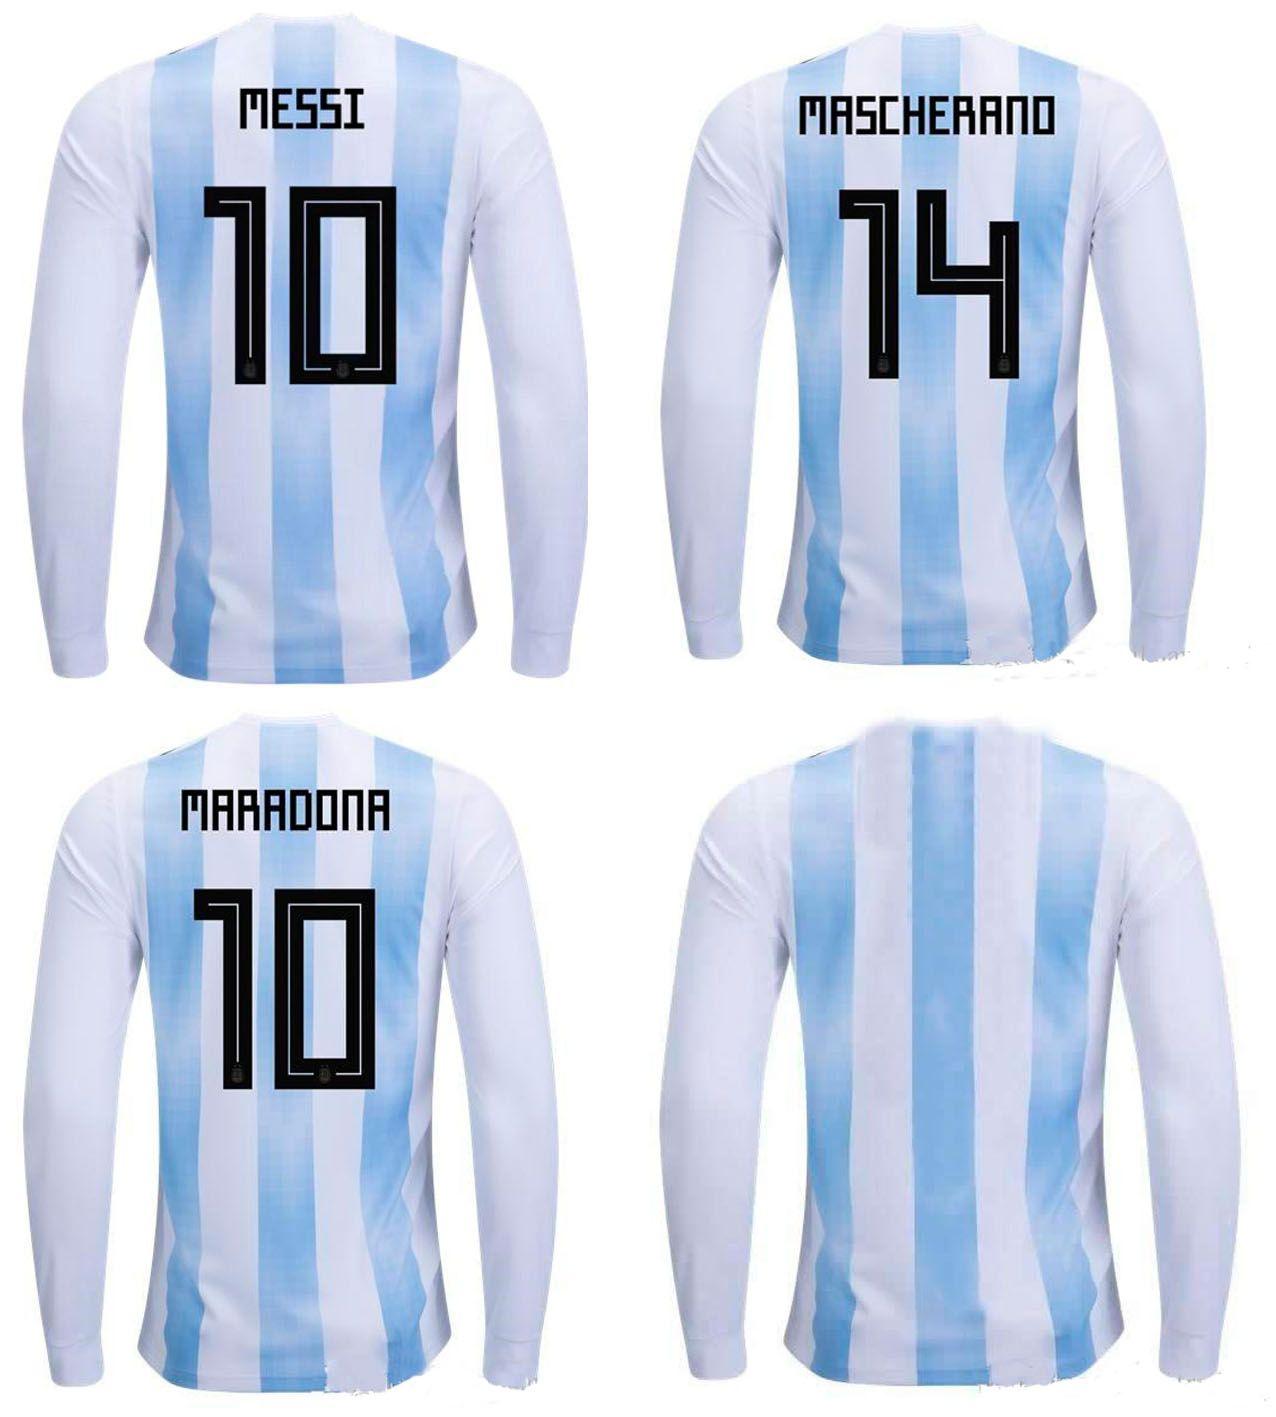 2de7c29a901 2018 Argentina Long Sleeve Soccer Jerseys Adult Top Thai Qulaity Full Sleeve  Football Tops World Cup 2018 Messi MARADONA DYBALA Soocer Shirt